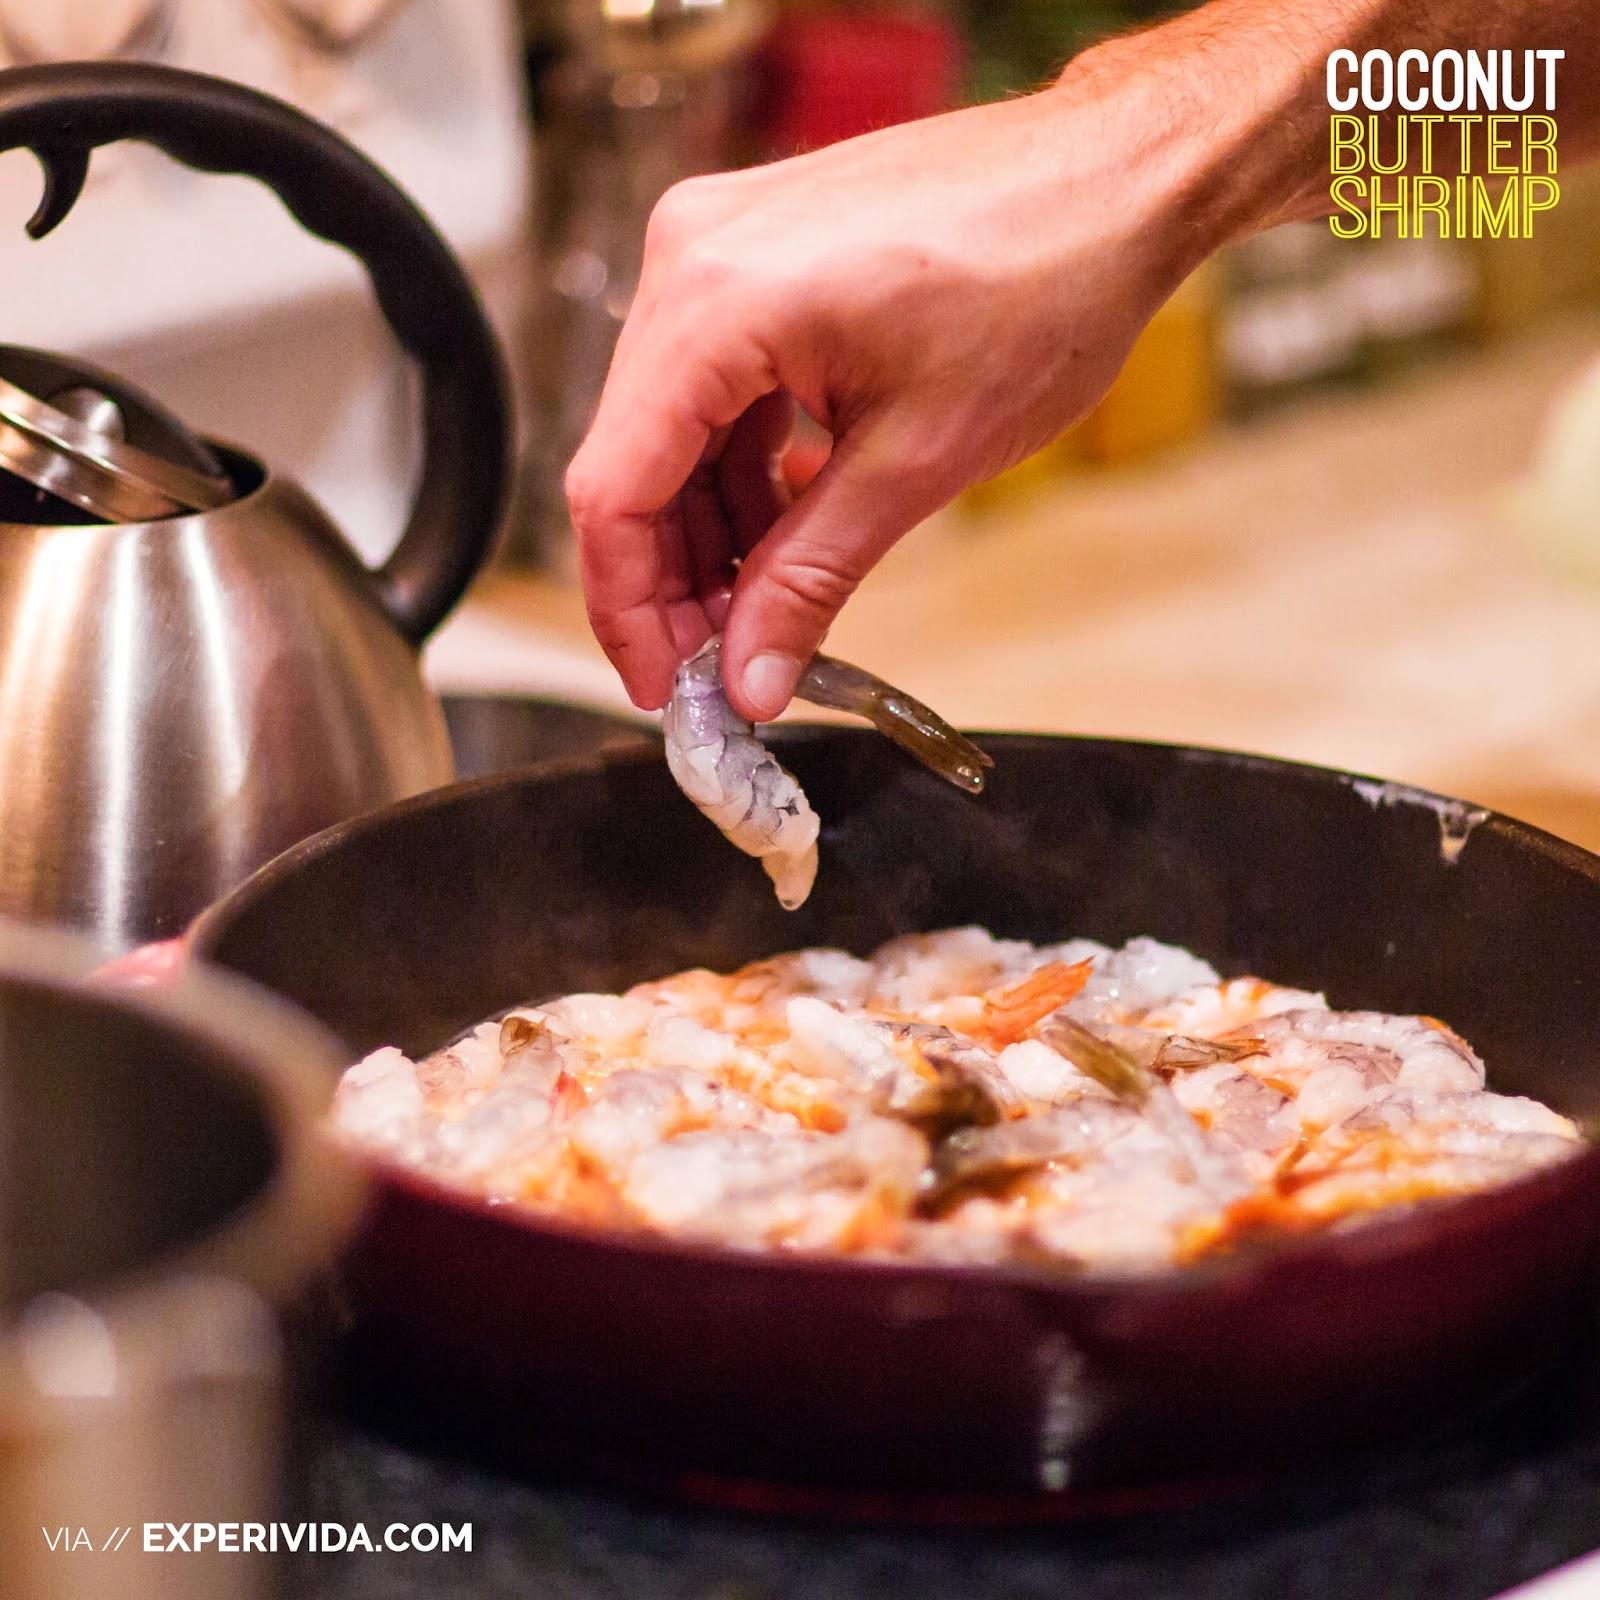 Coconut butter shrimp tasty 3 piece recipe made easy experivida cooking procedure forumfinder Choice Image